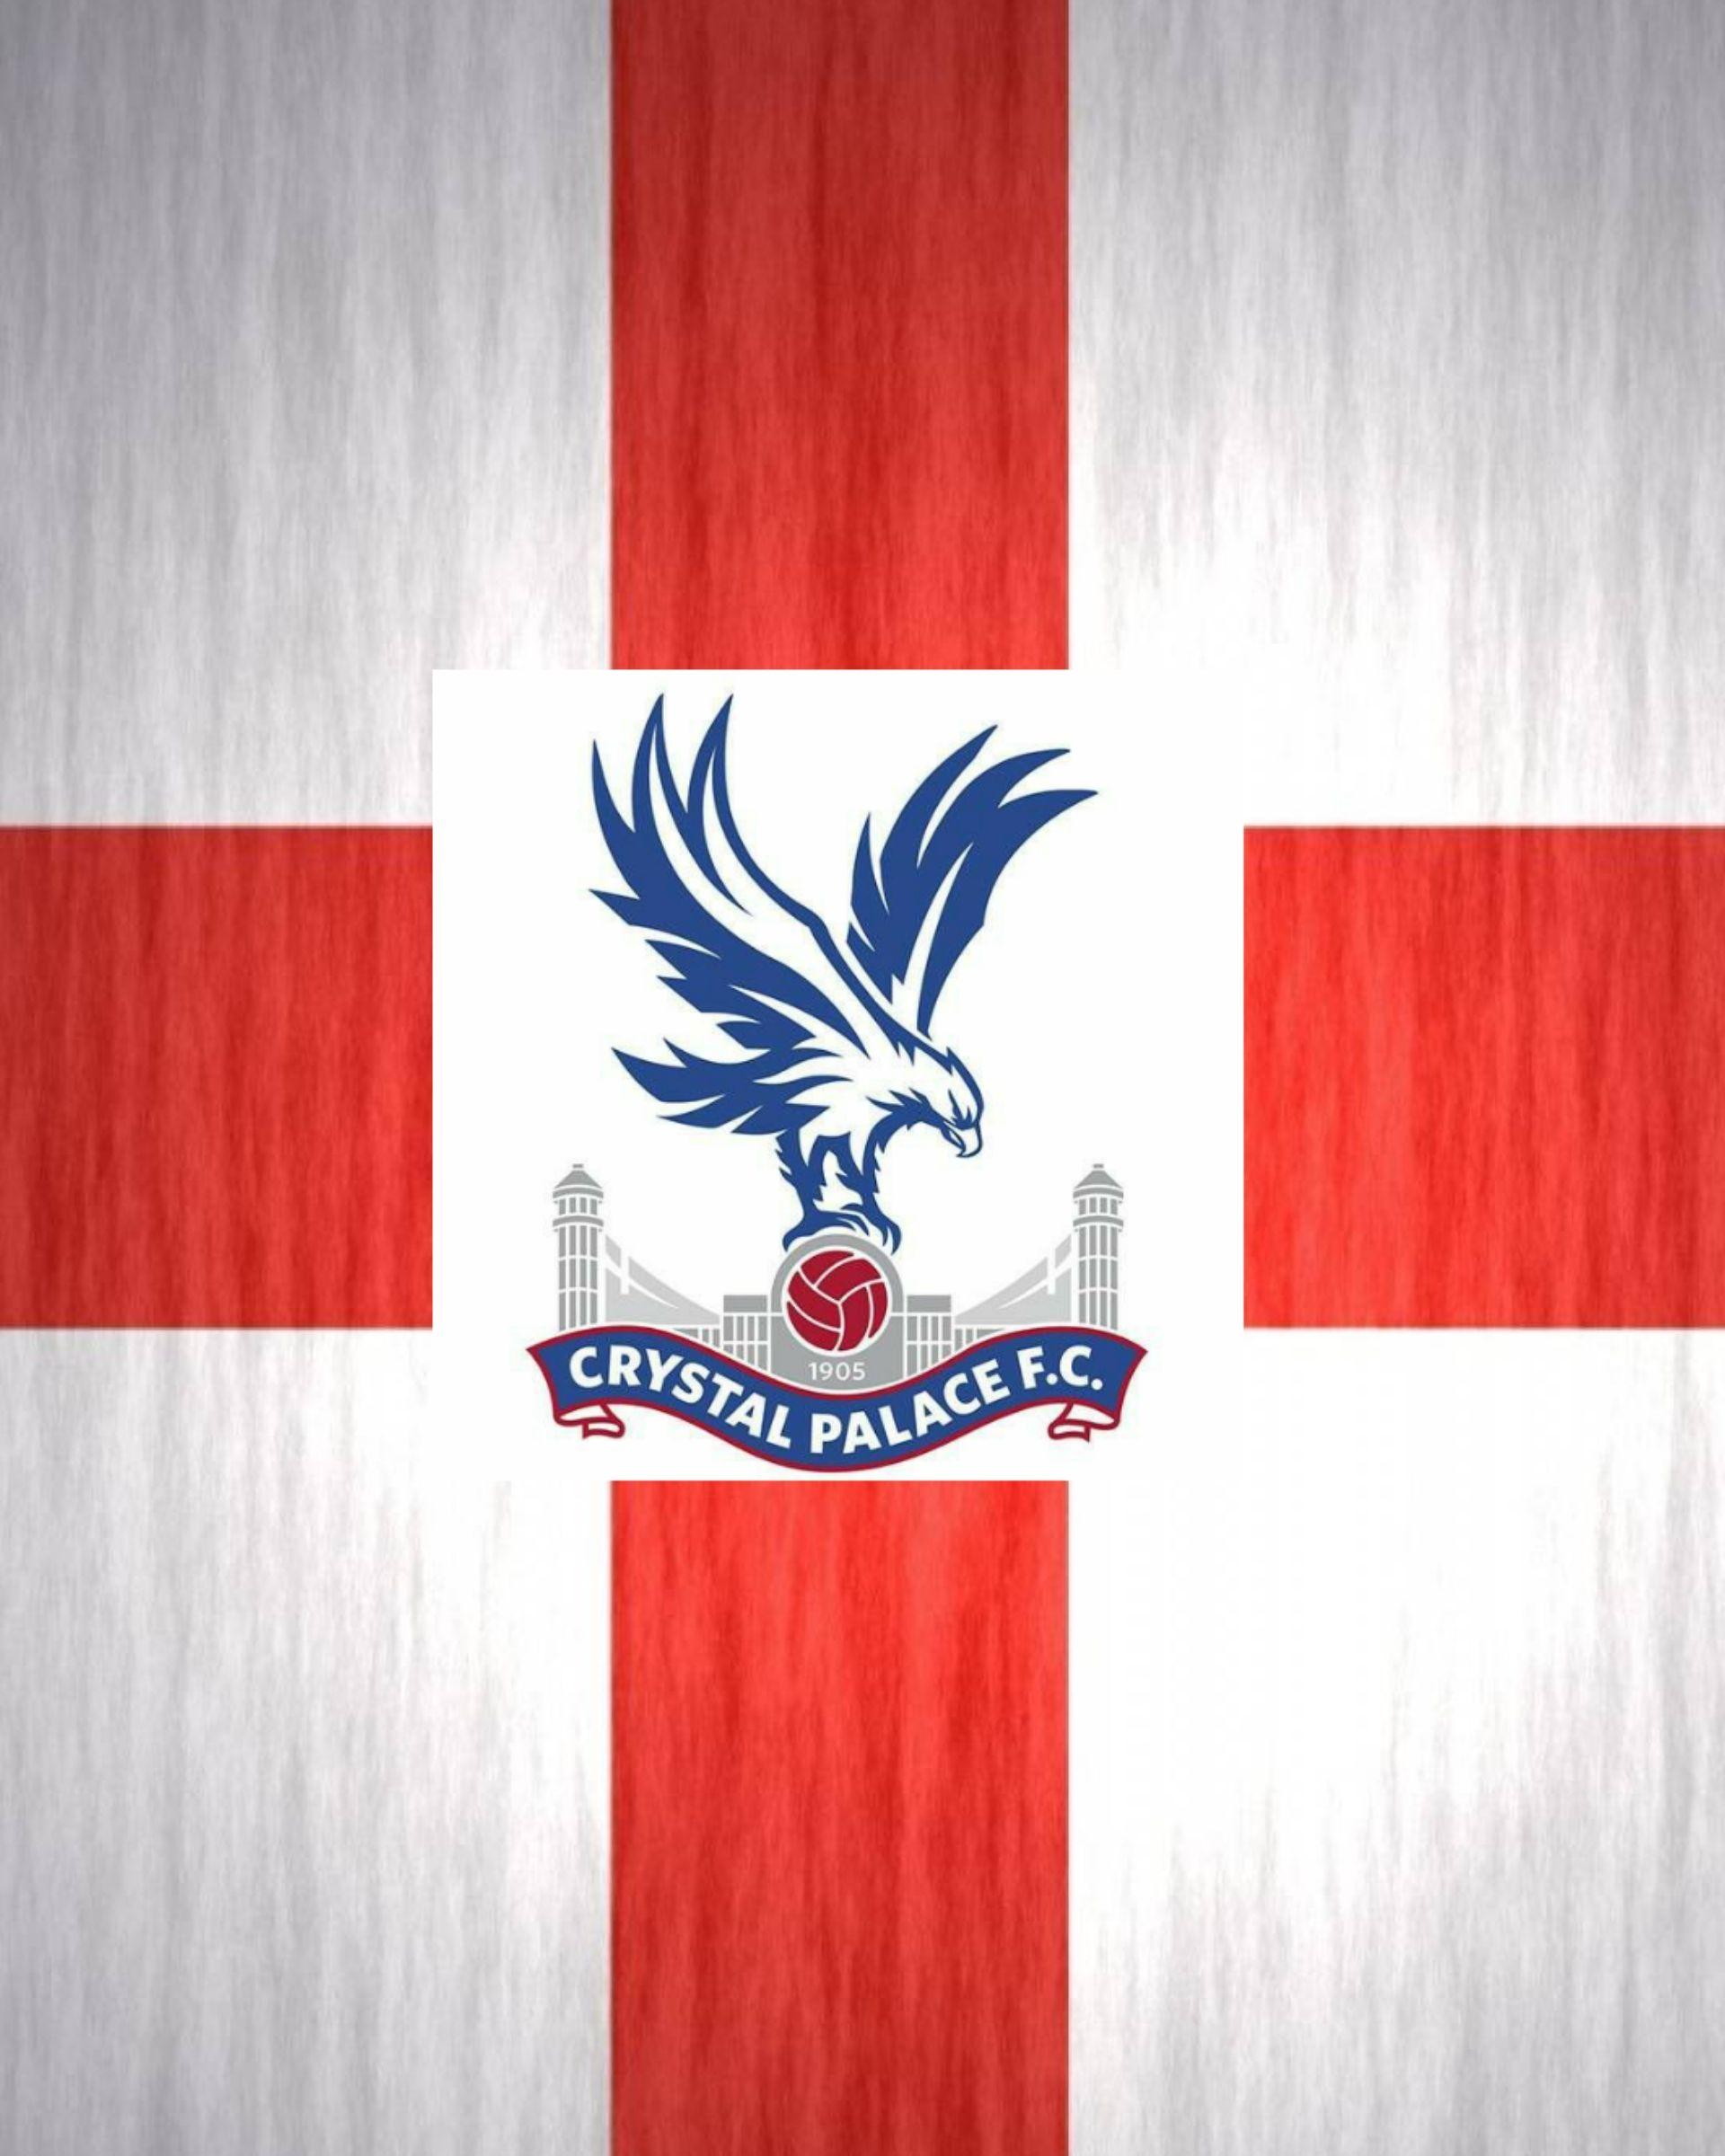 Pin on Crystal Palace FC